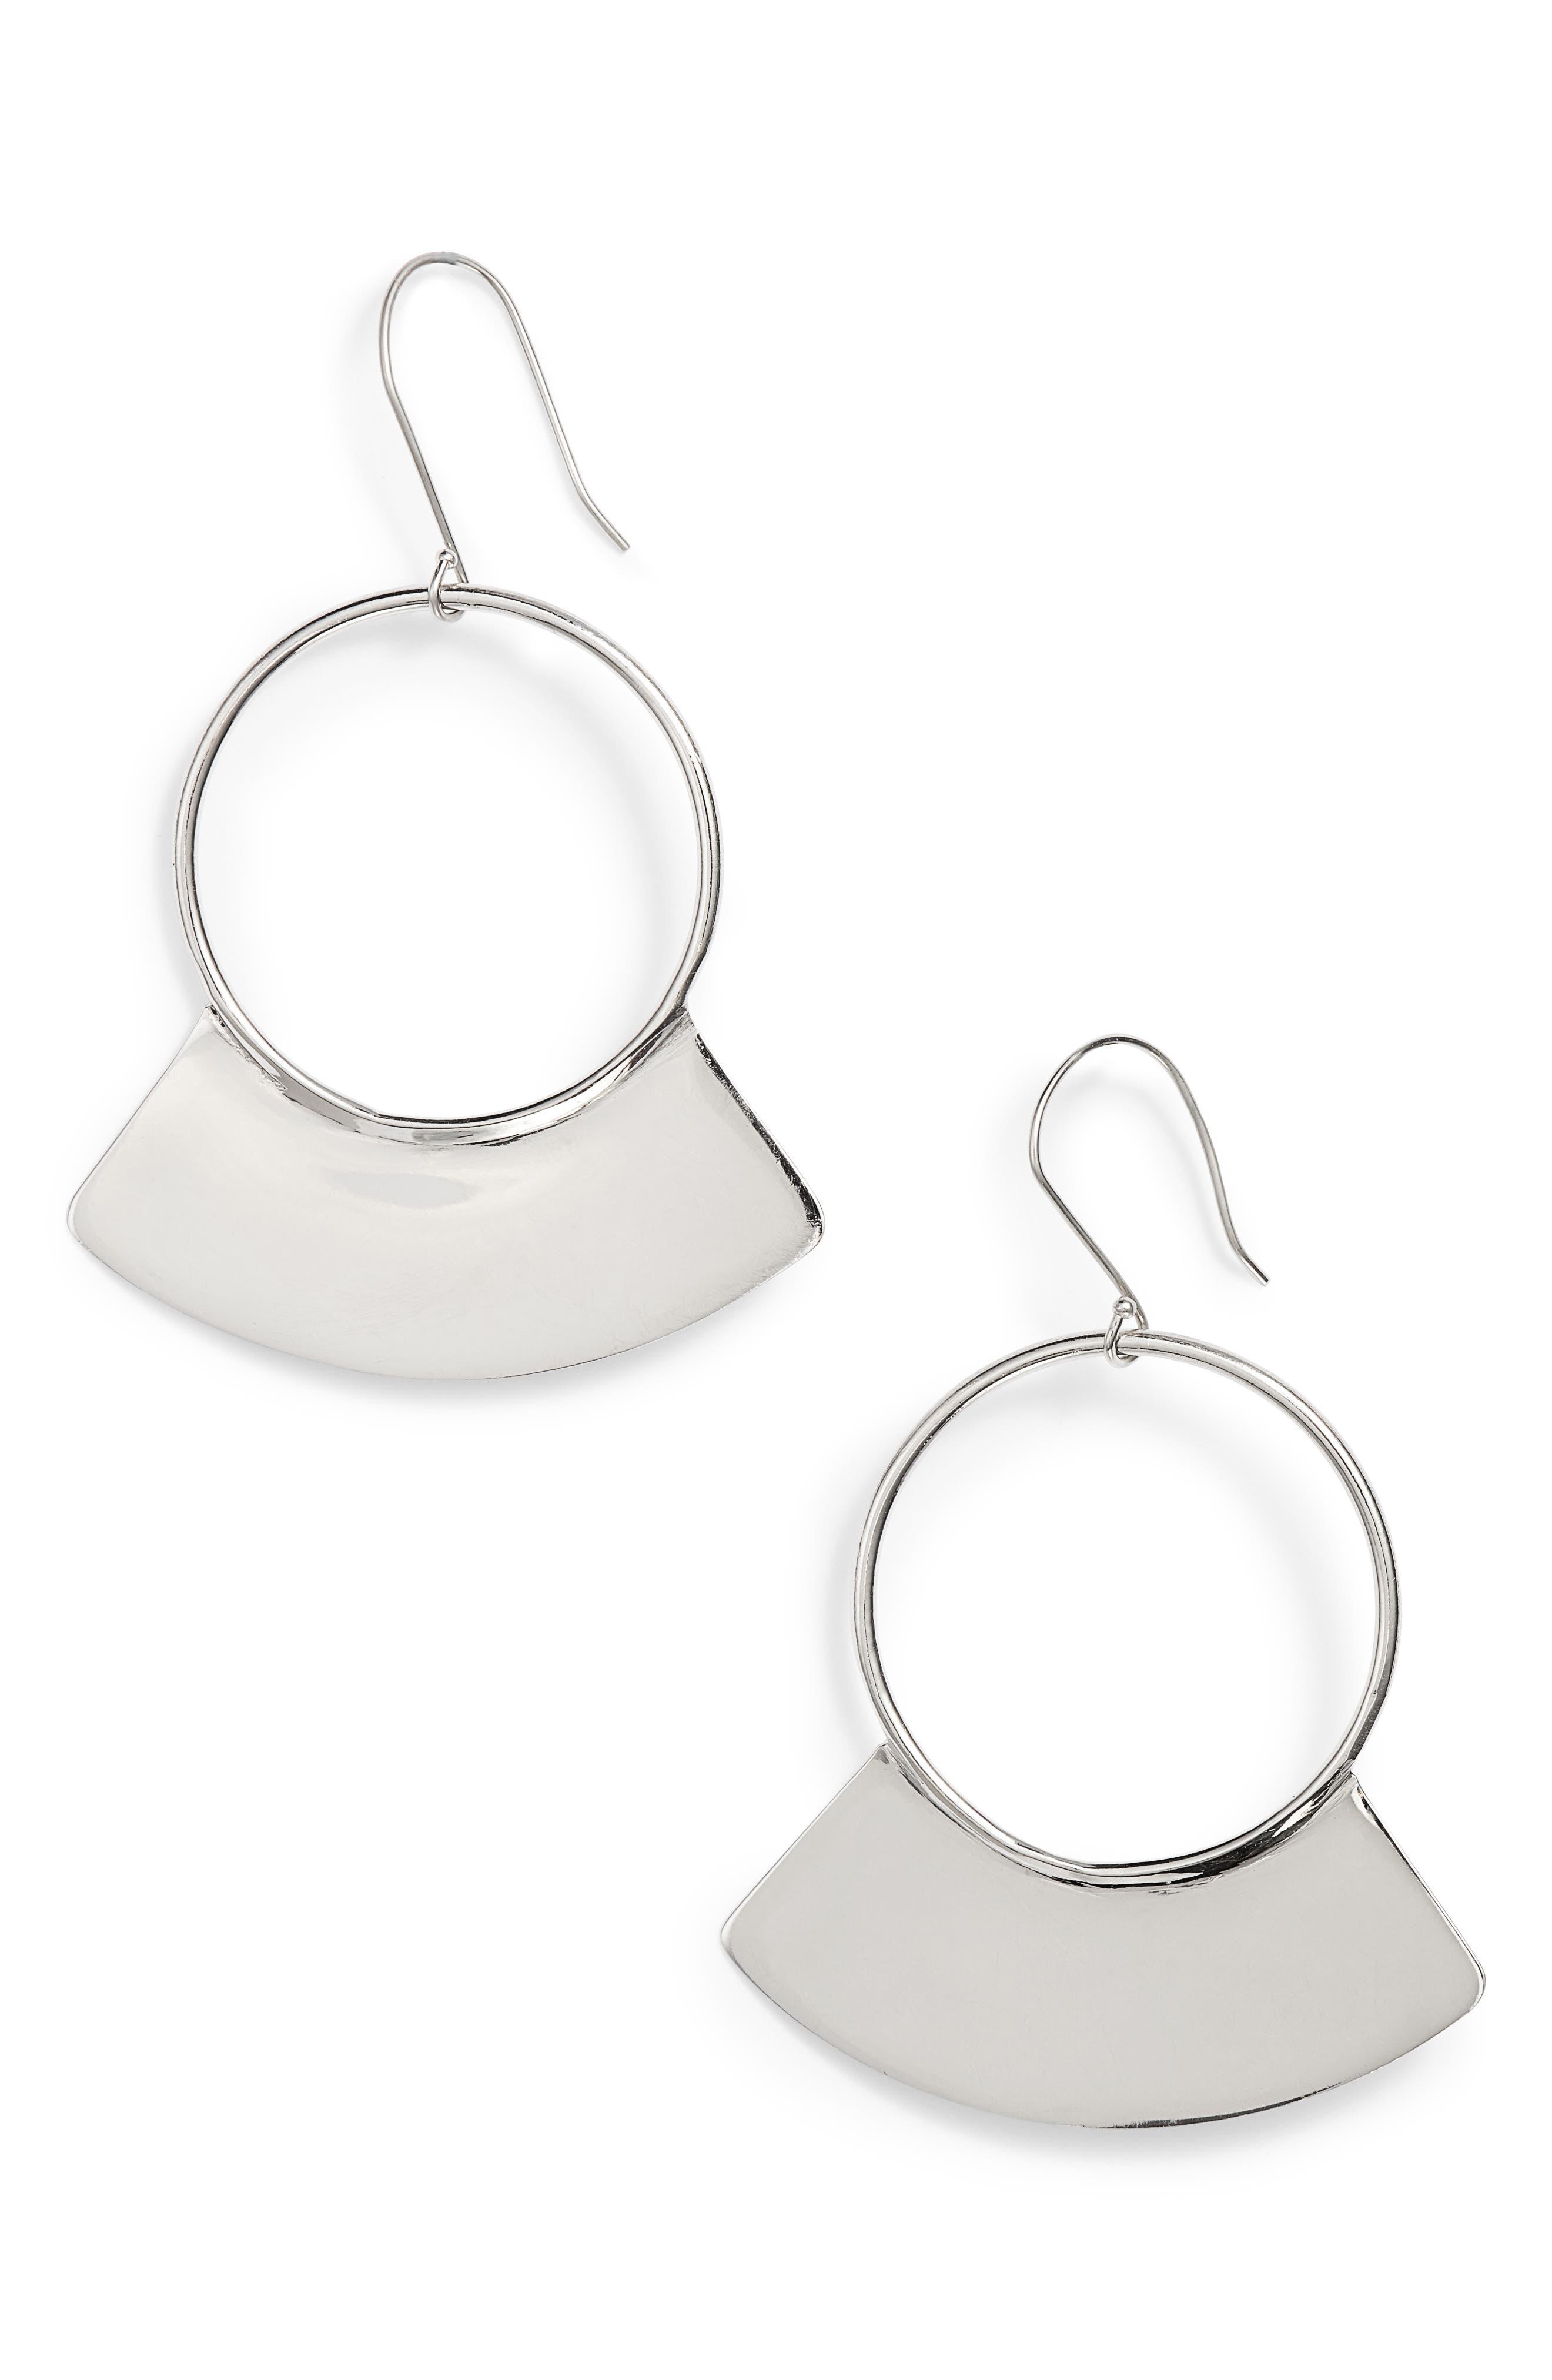 Main Image - Soko Paddle Earrings